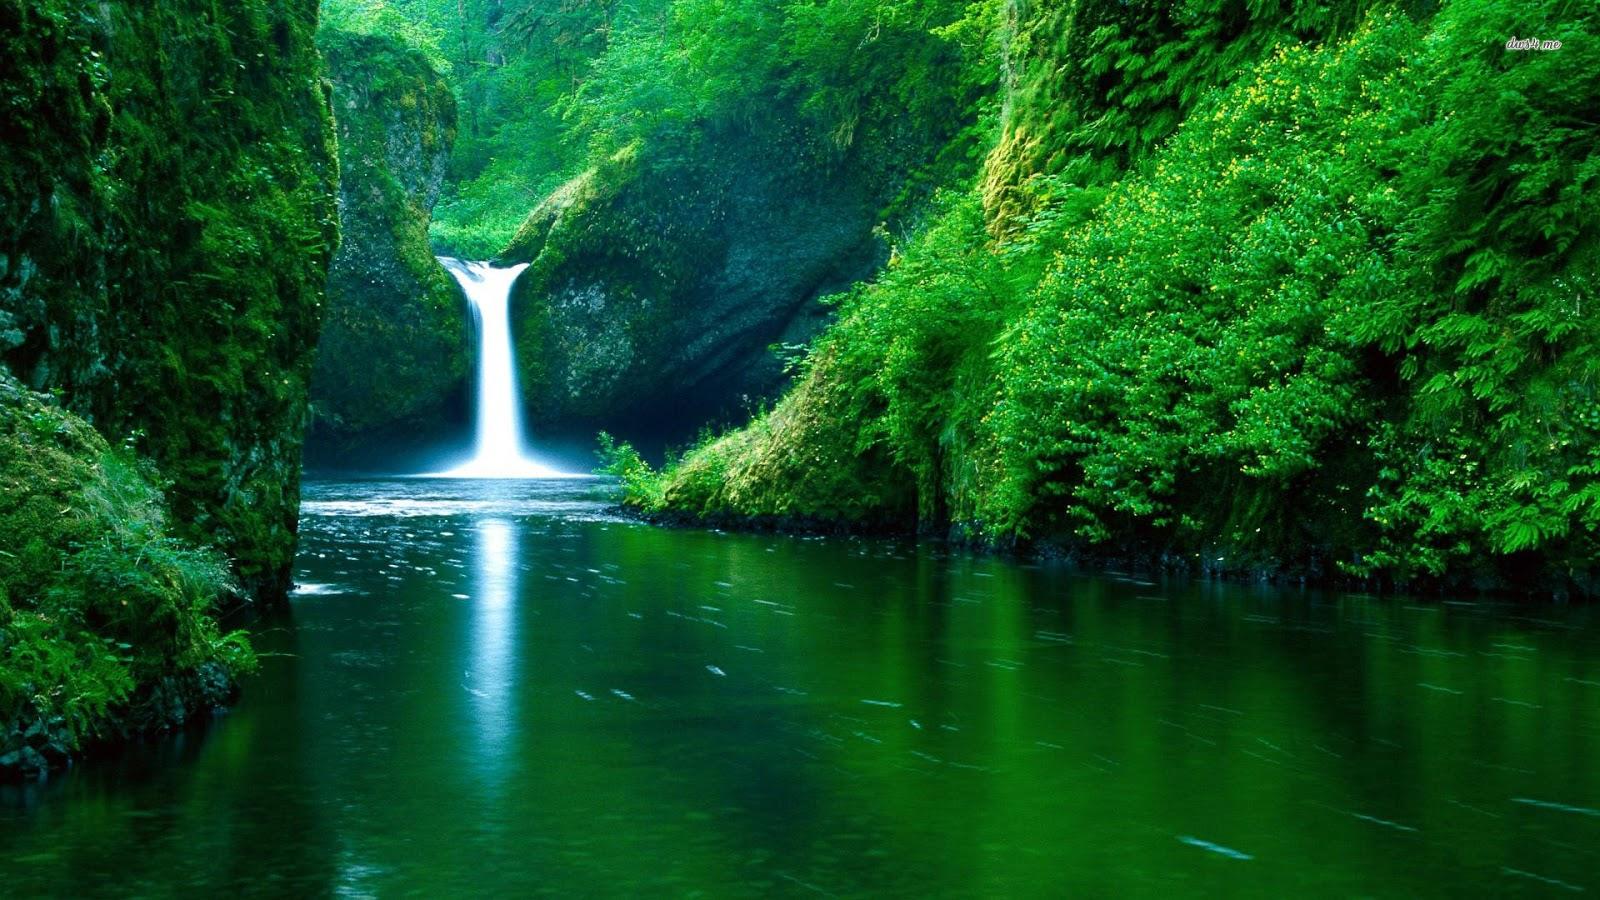 http://2.bp.blogspot.com/-SfeoDsIKvcE/UJVKOFoulDI/AAAAAAAAPj8/tSyYZl7OHVQ/s1600/4376-waterfall-1920x1080-nature-wallpaper.jpg